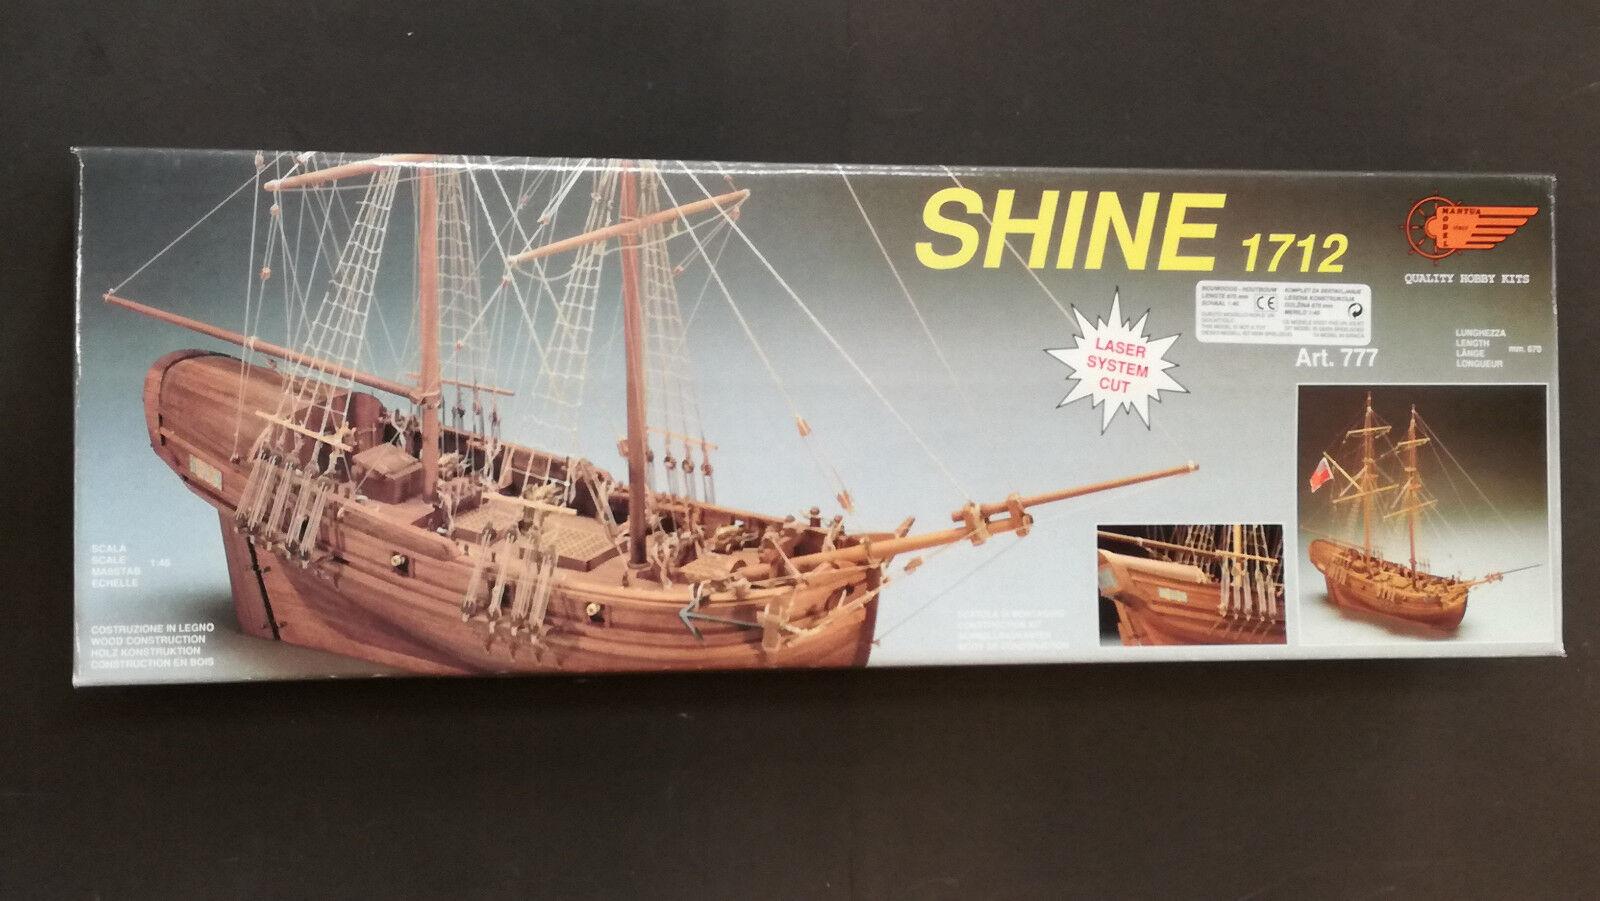 Mantua Model kit Legno barca Nave art 777 -  SHINE 1712